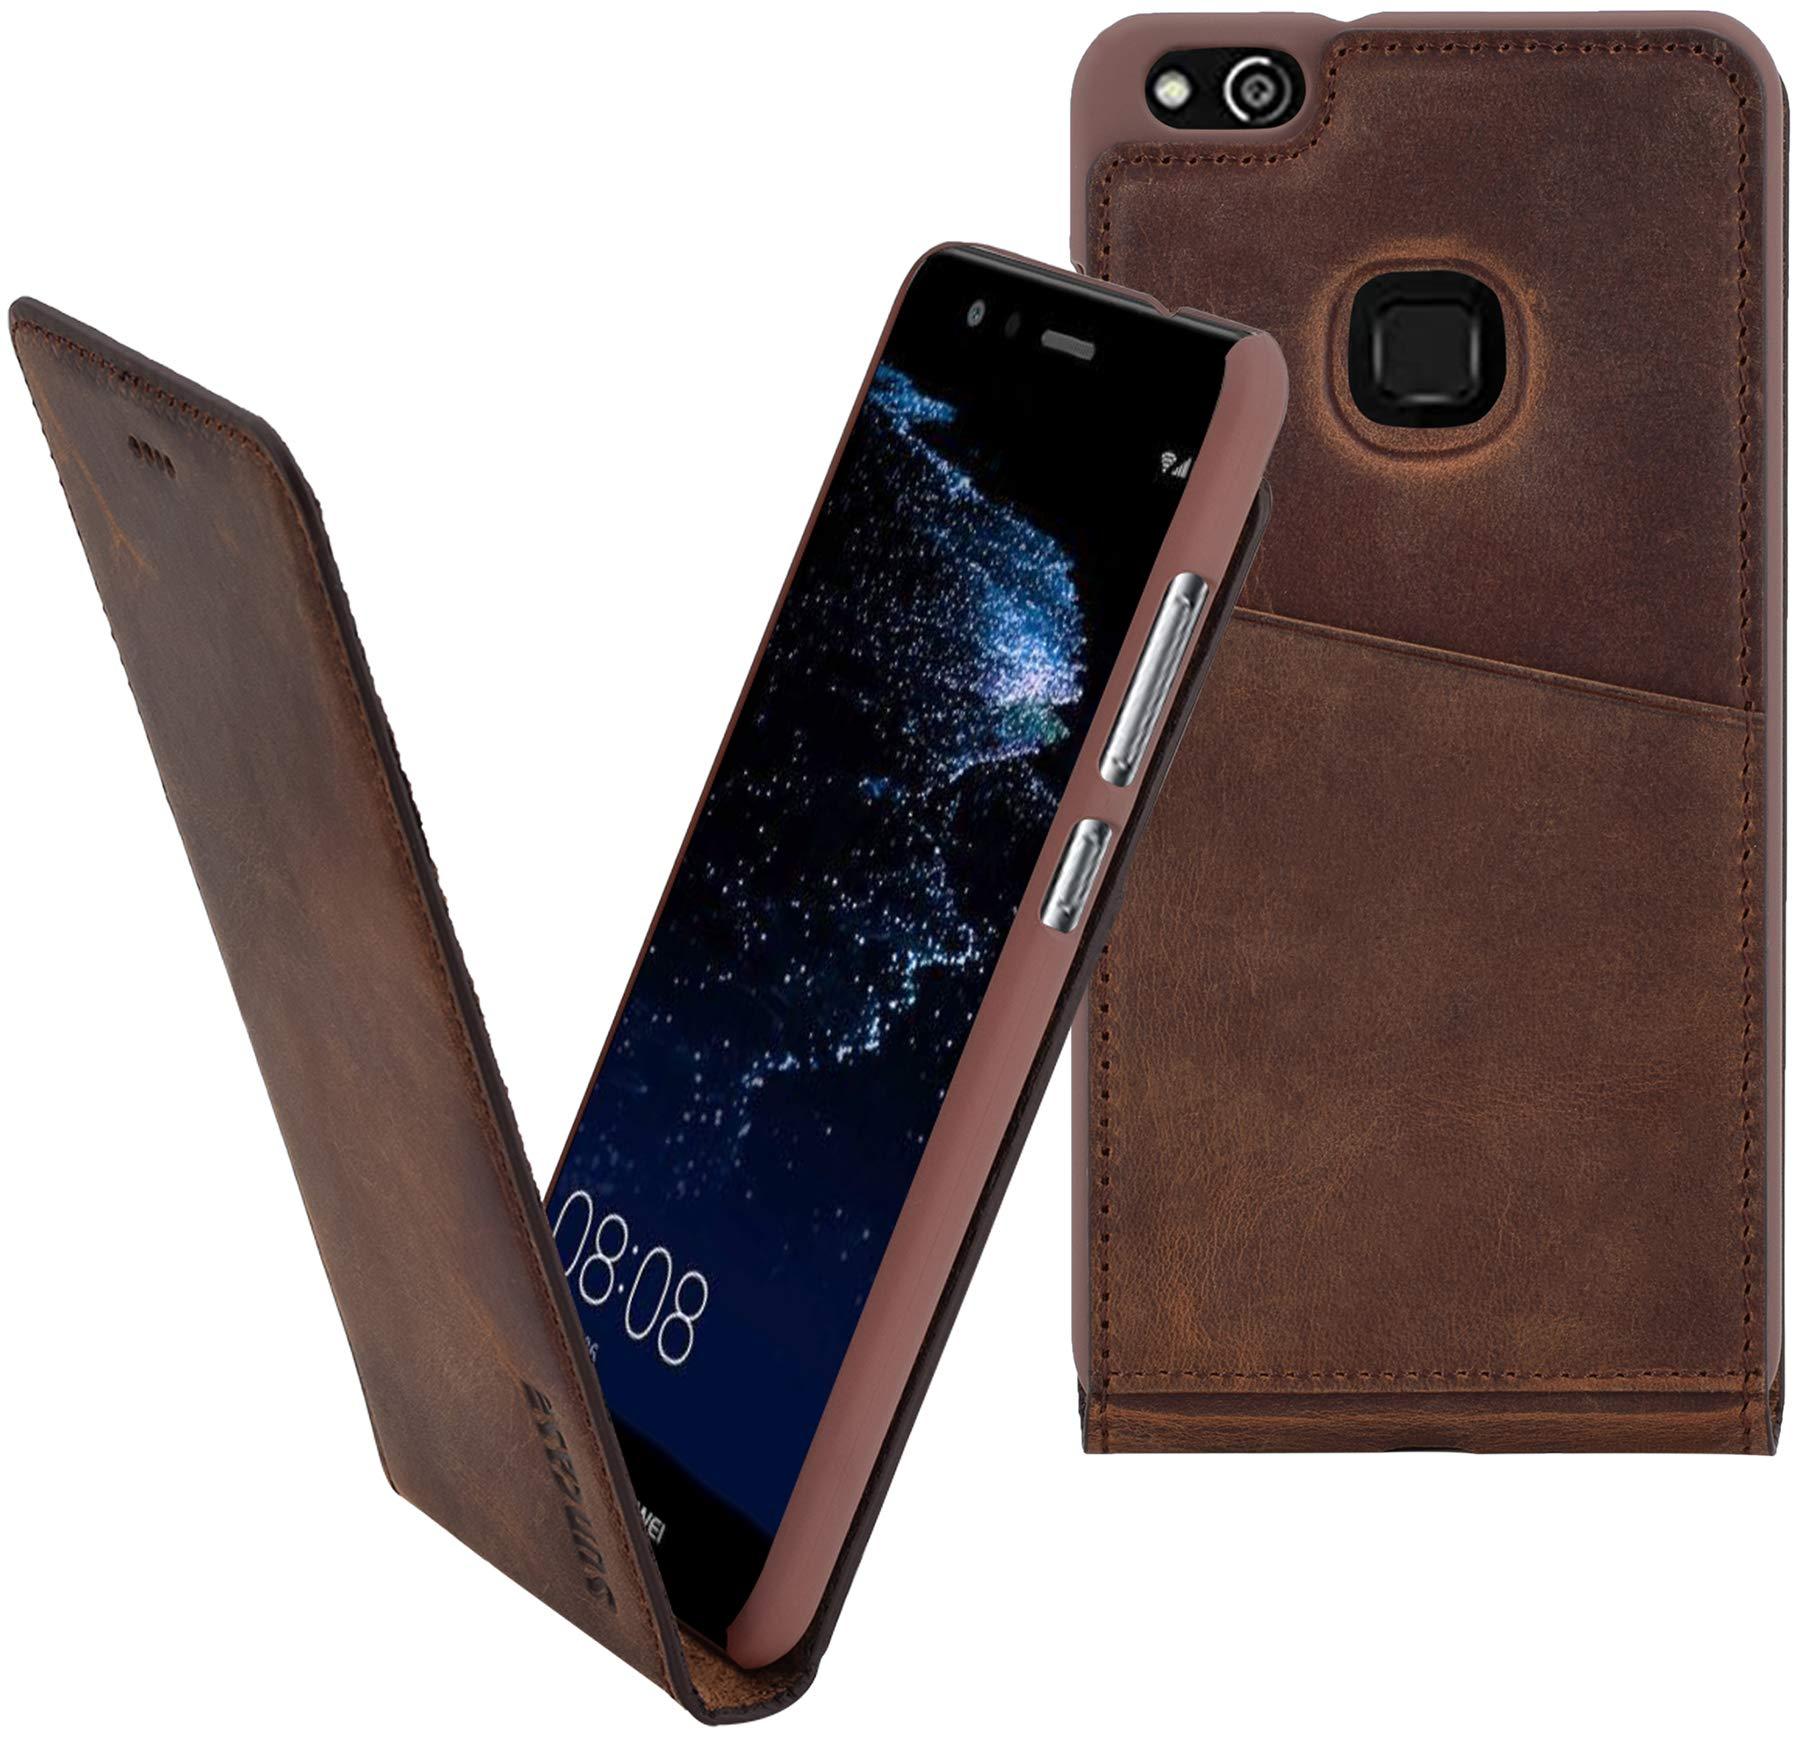 Suncase Huawei P10 Lite | Original Flip-Style (Ultra-Slim) Piel Funda Carcasa Case Cover Carcasa: Amazon.es: Electrónica